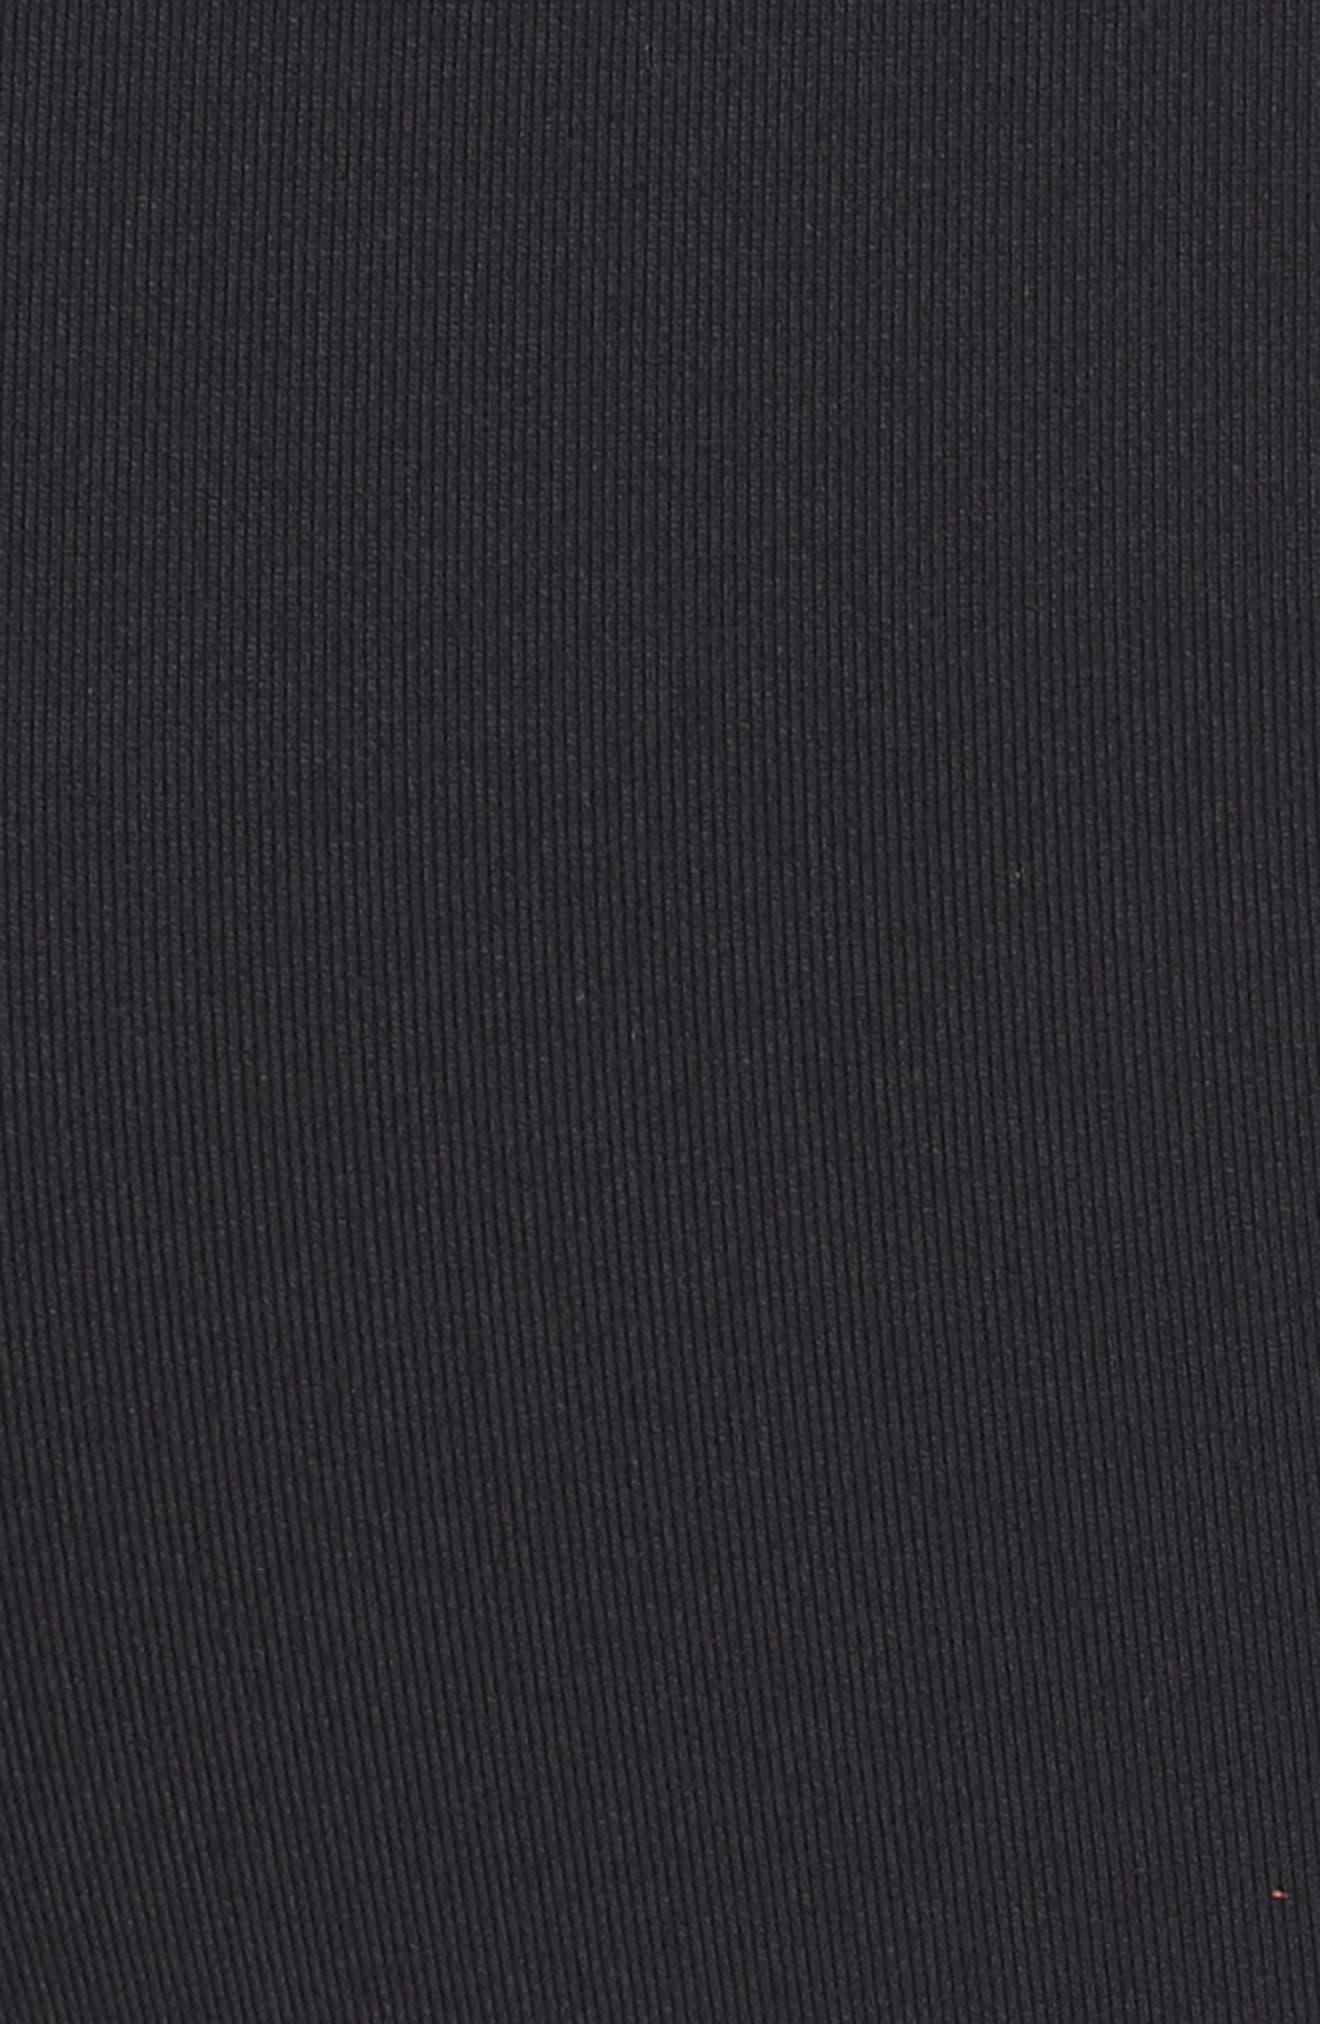 71149 High Waist Crop Leggings,                             Alternate thumbnail 6, color,                             001